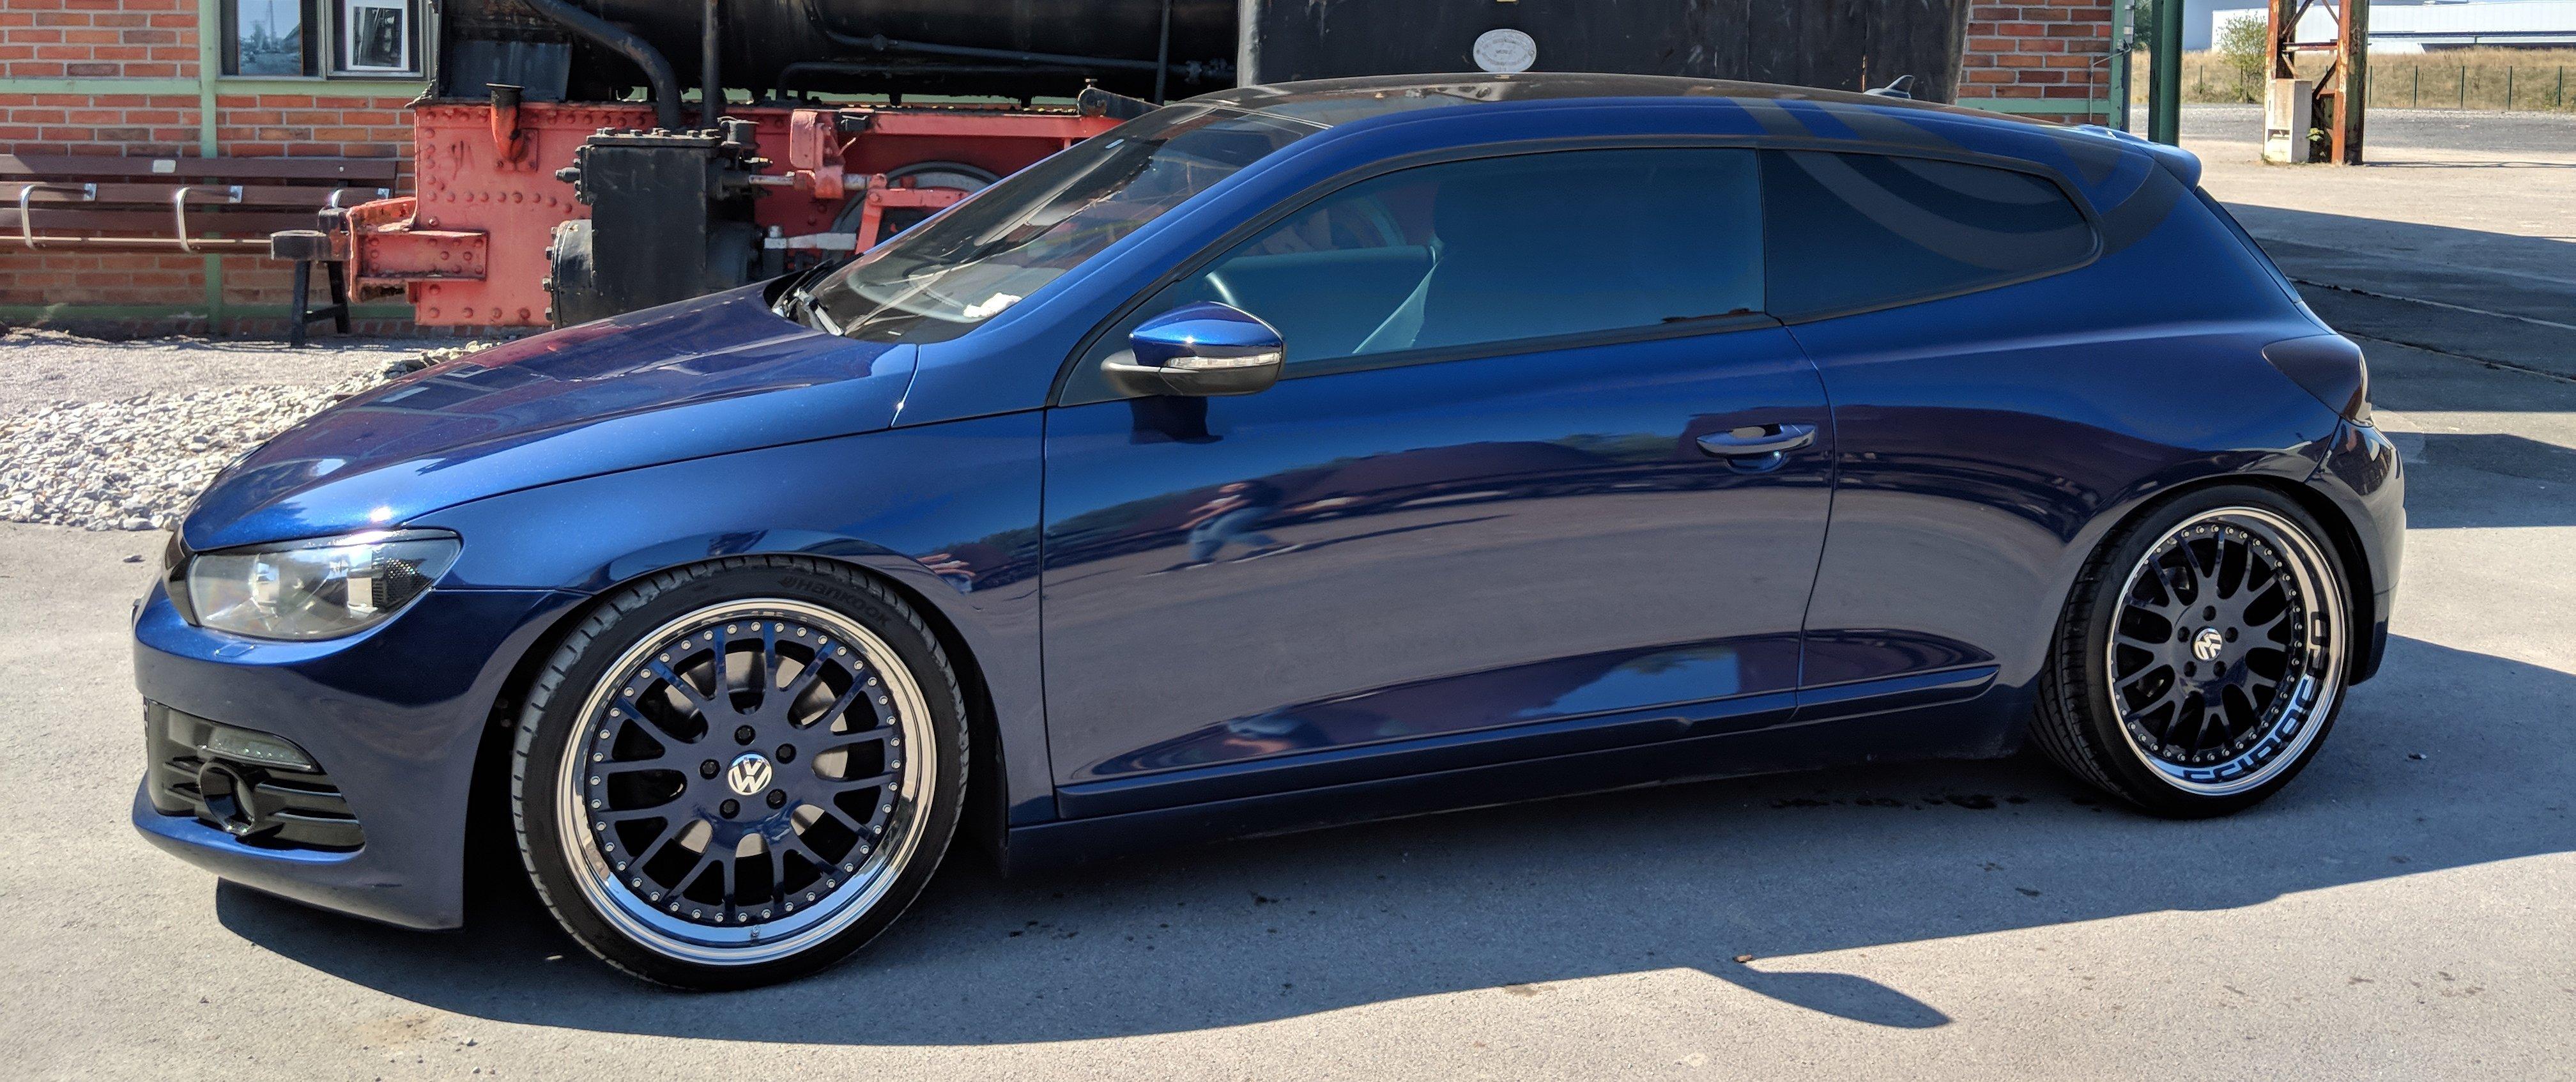 VW – Scirocco – CARLINE – M1 – Blau – 19 Zoll